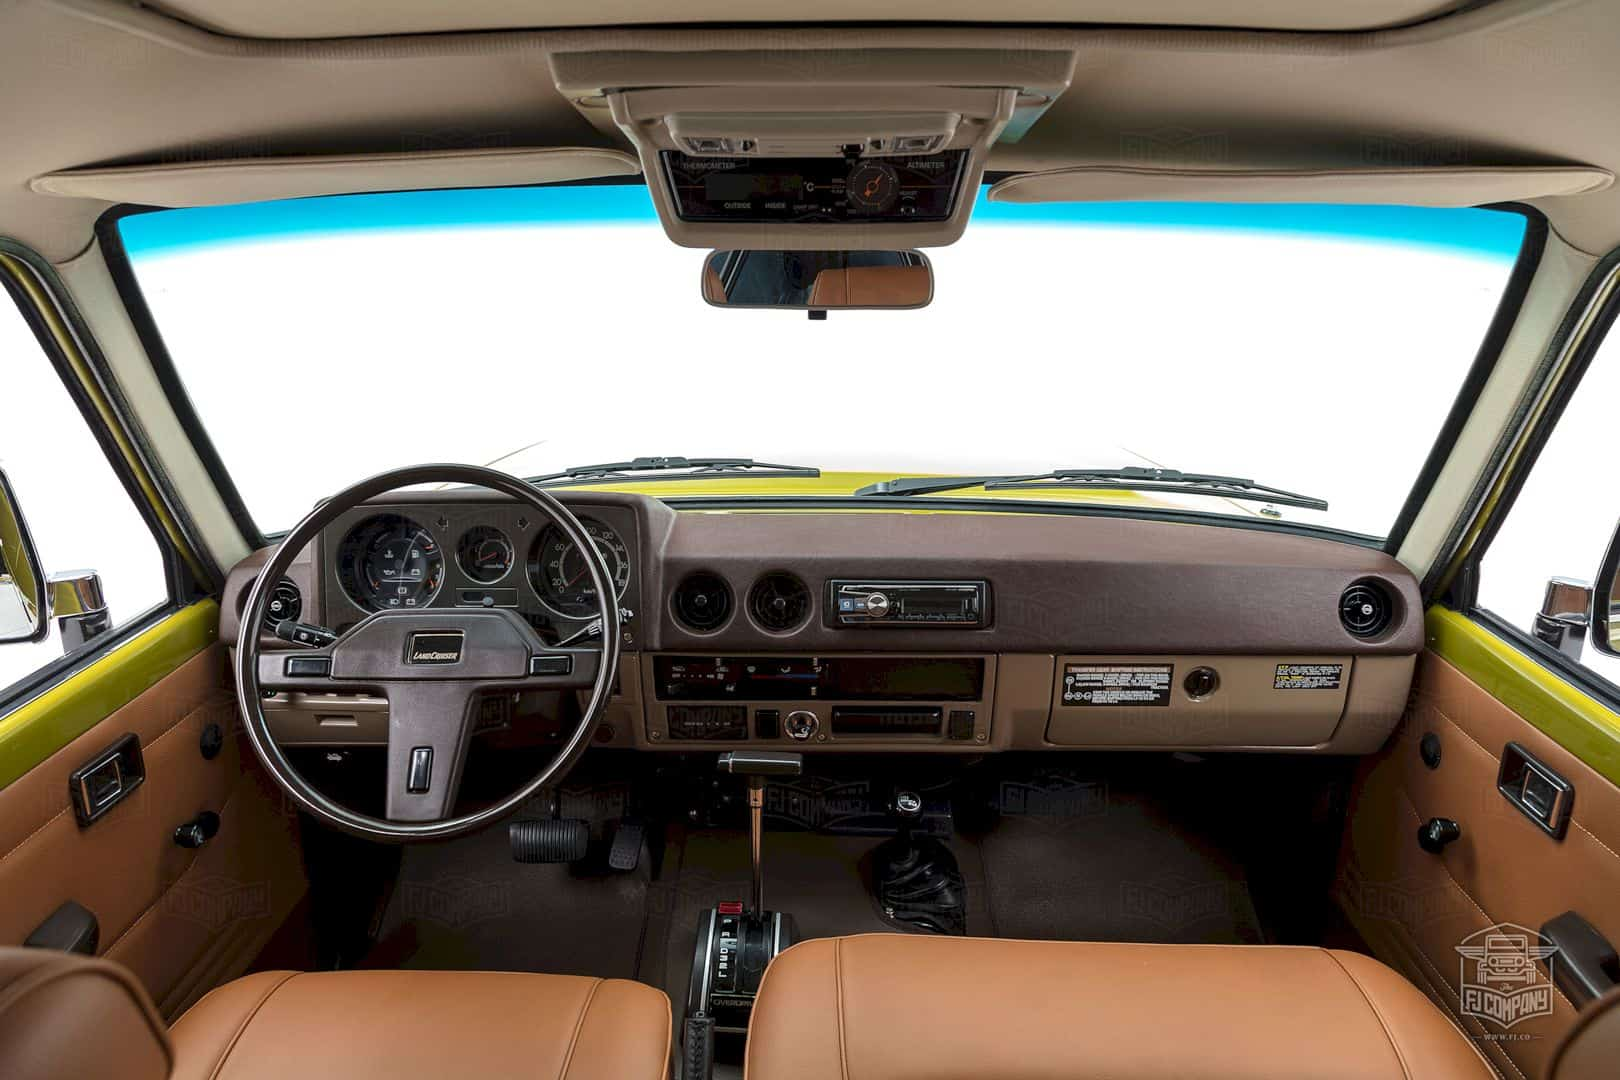 1986 Toyota Land Cruiser Fj62 Olive 4